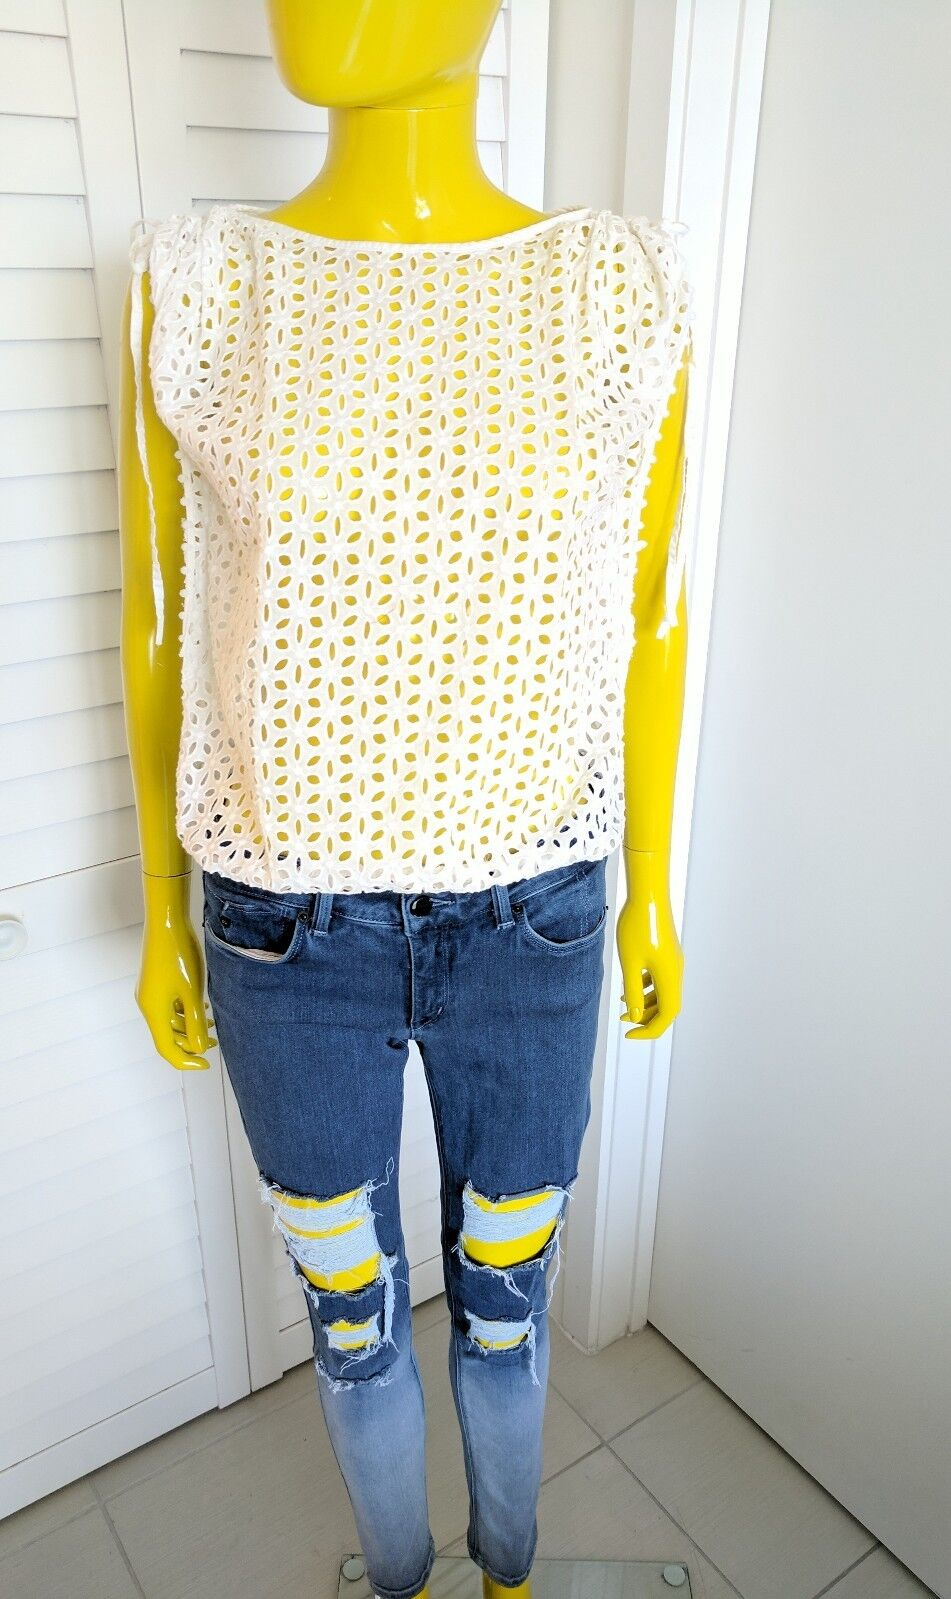 VERSACE COLLECTION T-Shirt L taglia. L T-Shirt uomo neri V800491FVJ00412-V1008 mettere offerta f60a5c